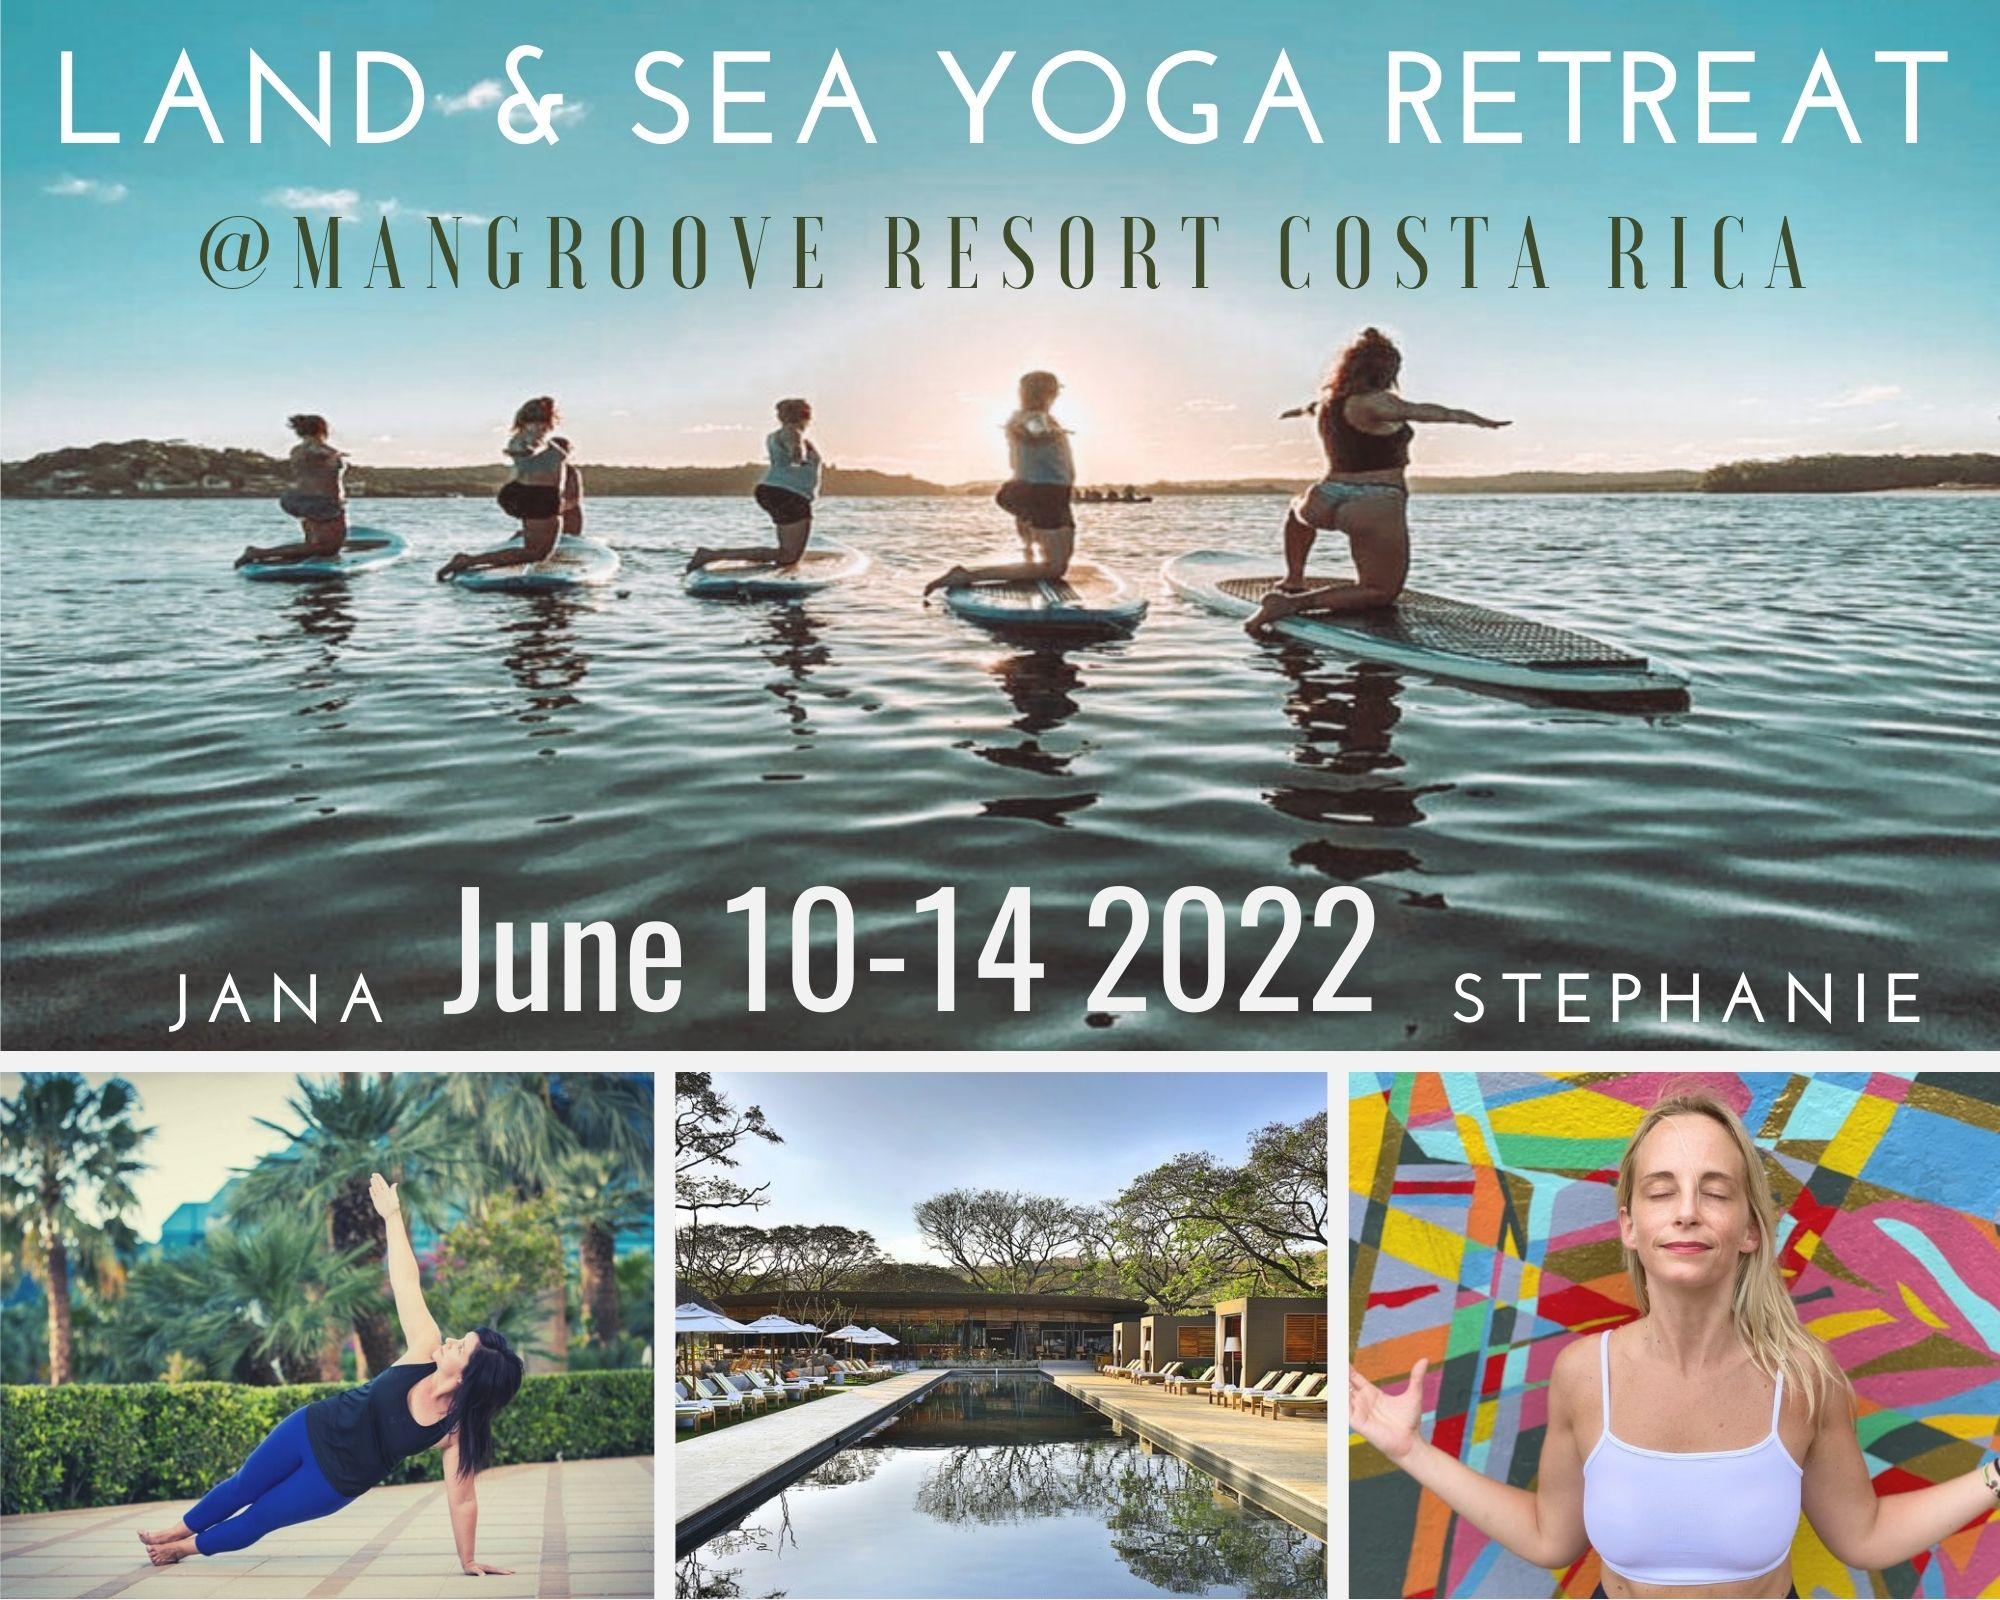 Land & Sea June 10-14 2022